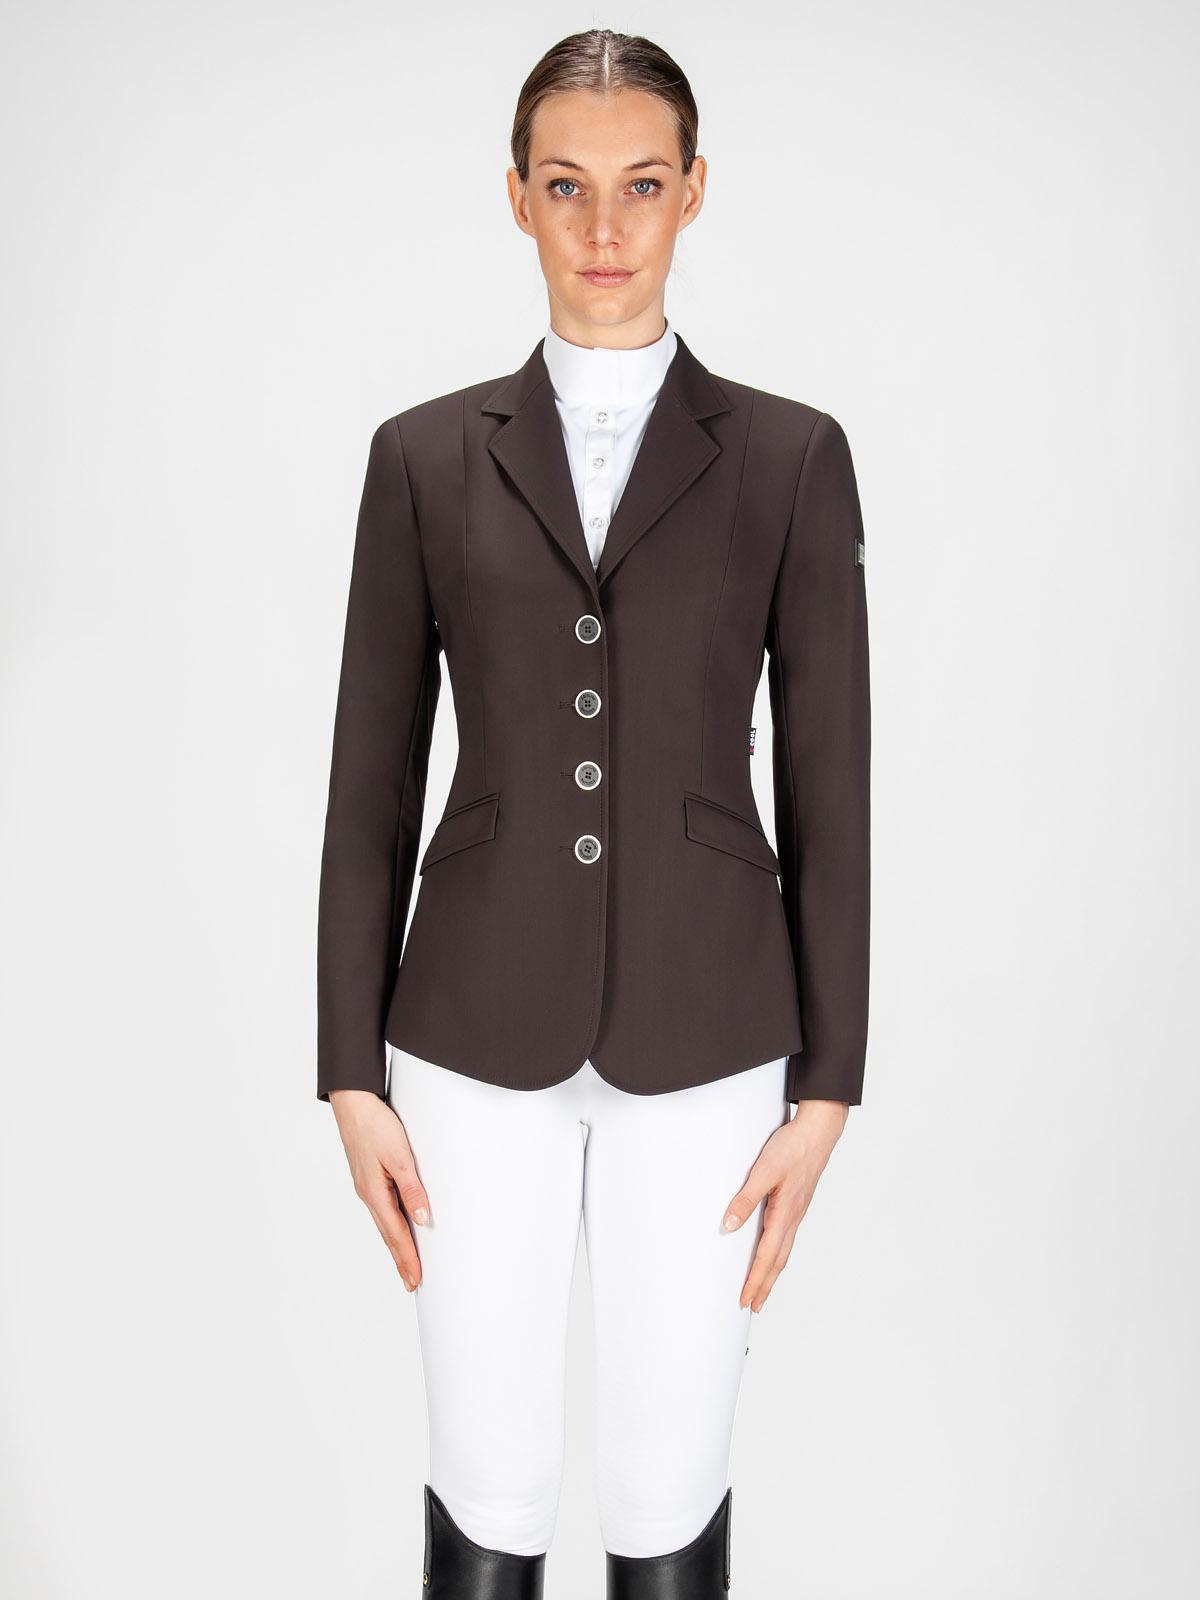 Gait women's show coat in X-Cool Evo performance fabric brown